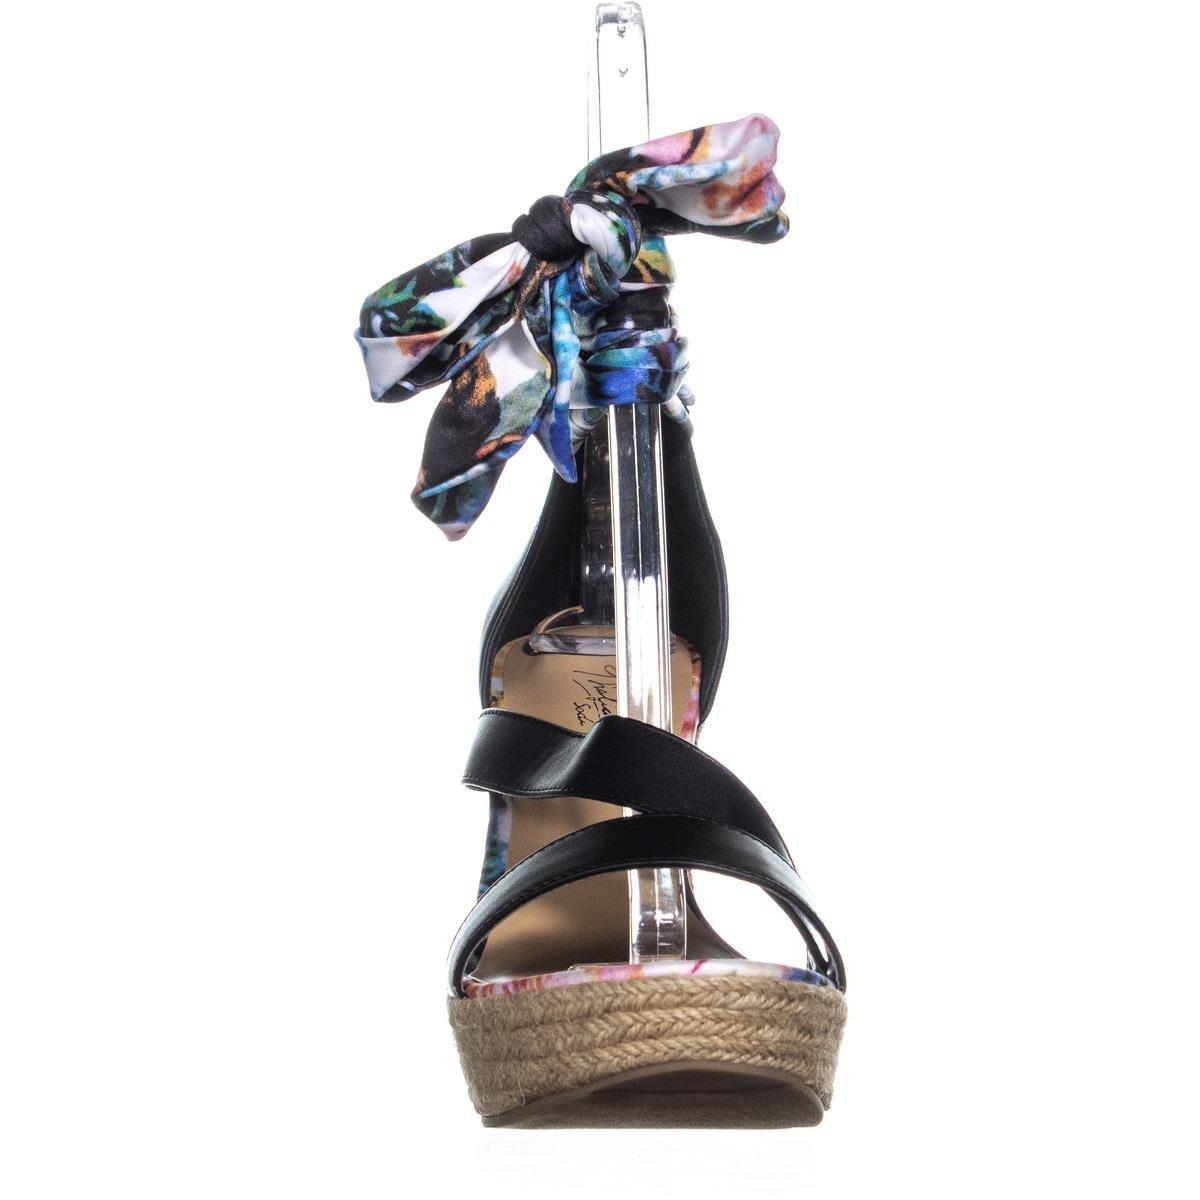 96ff0bcf416 Shop TS35 Pasa Tie Up Espadrilles Wedge Sandals